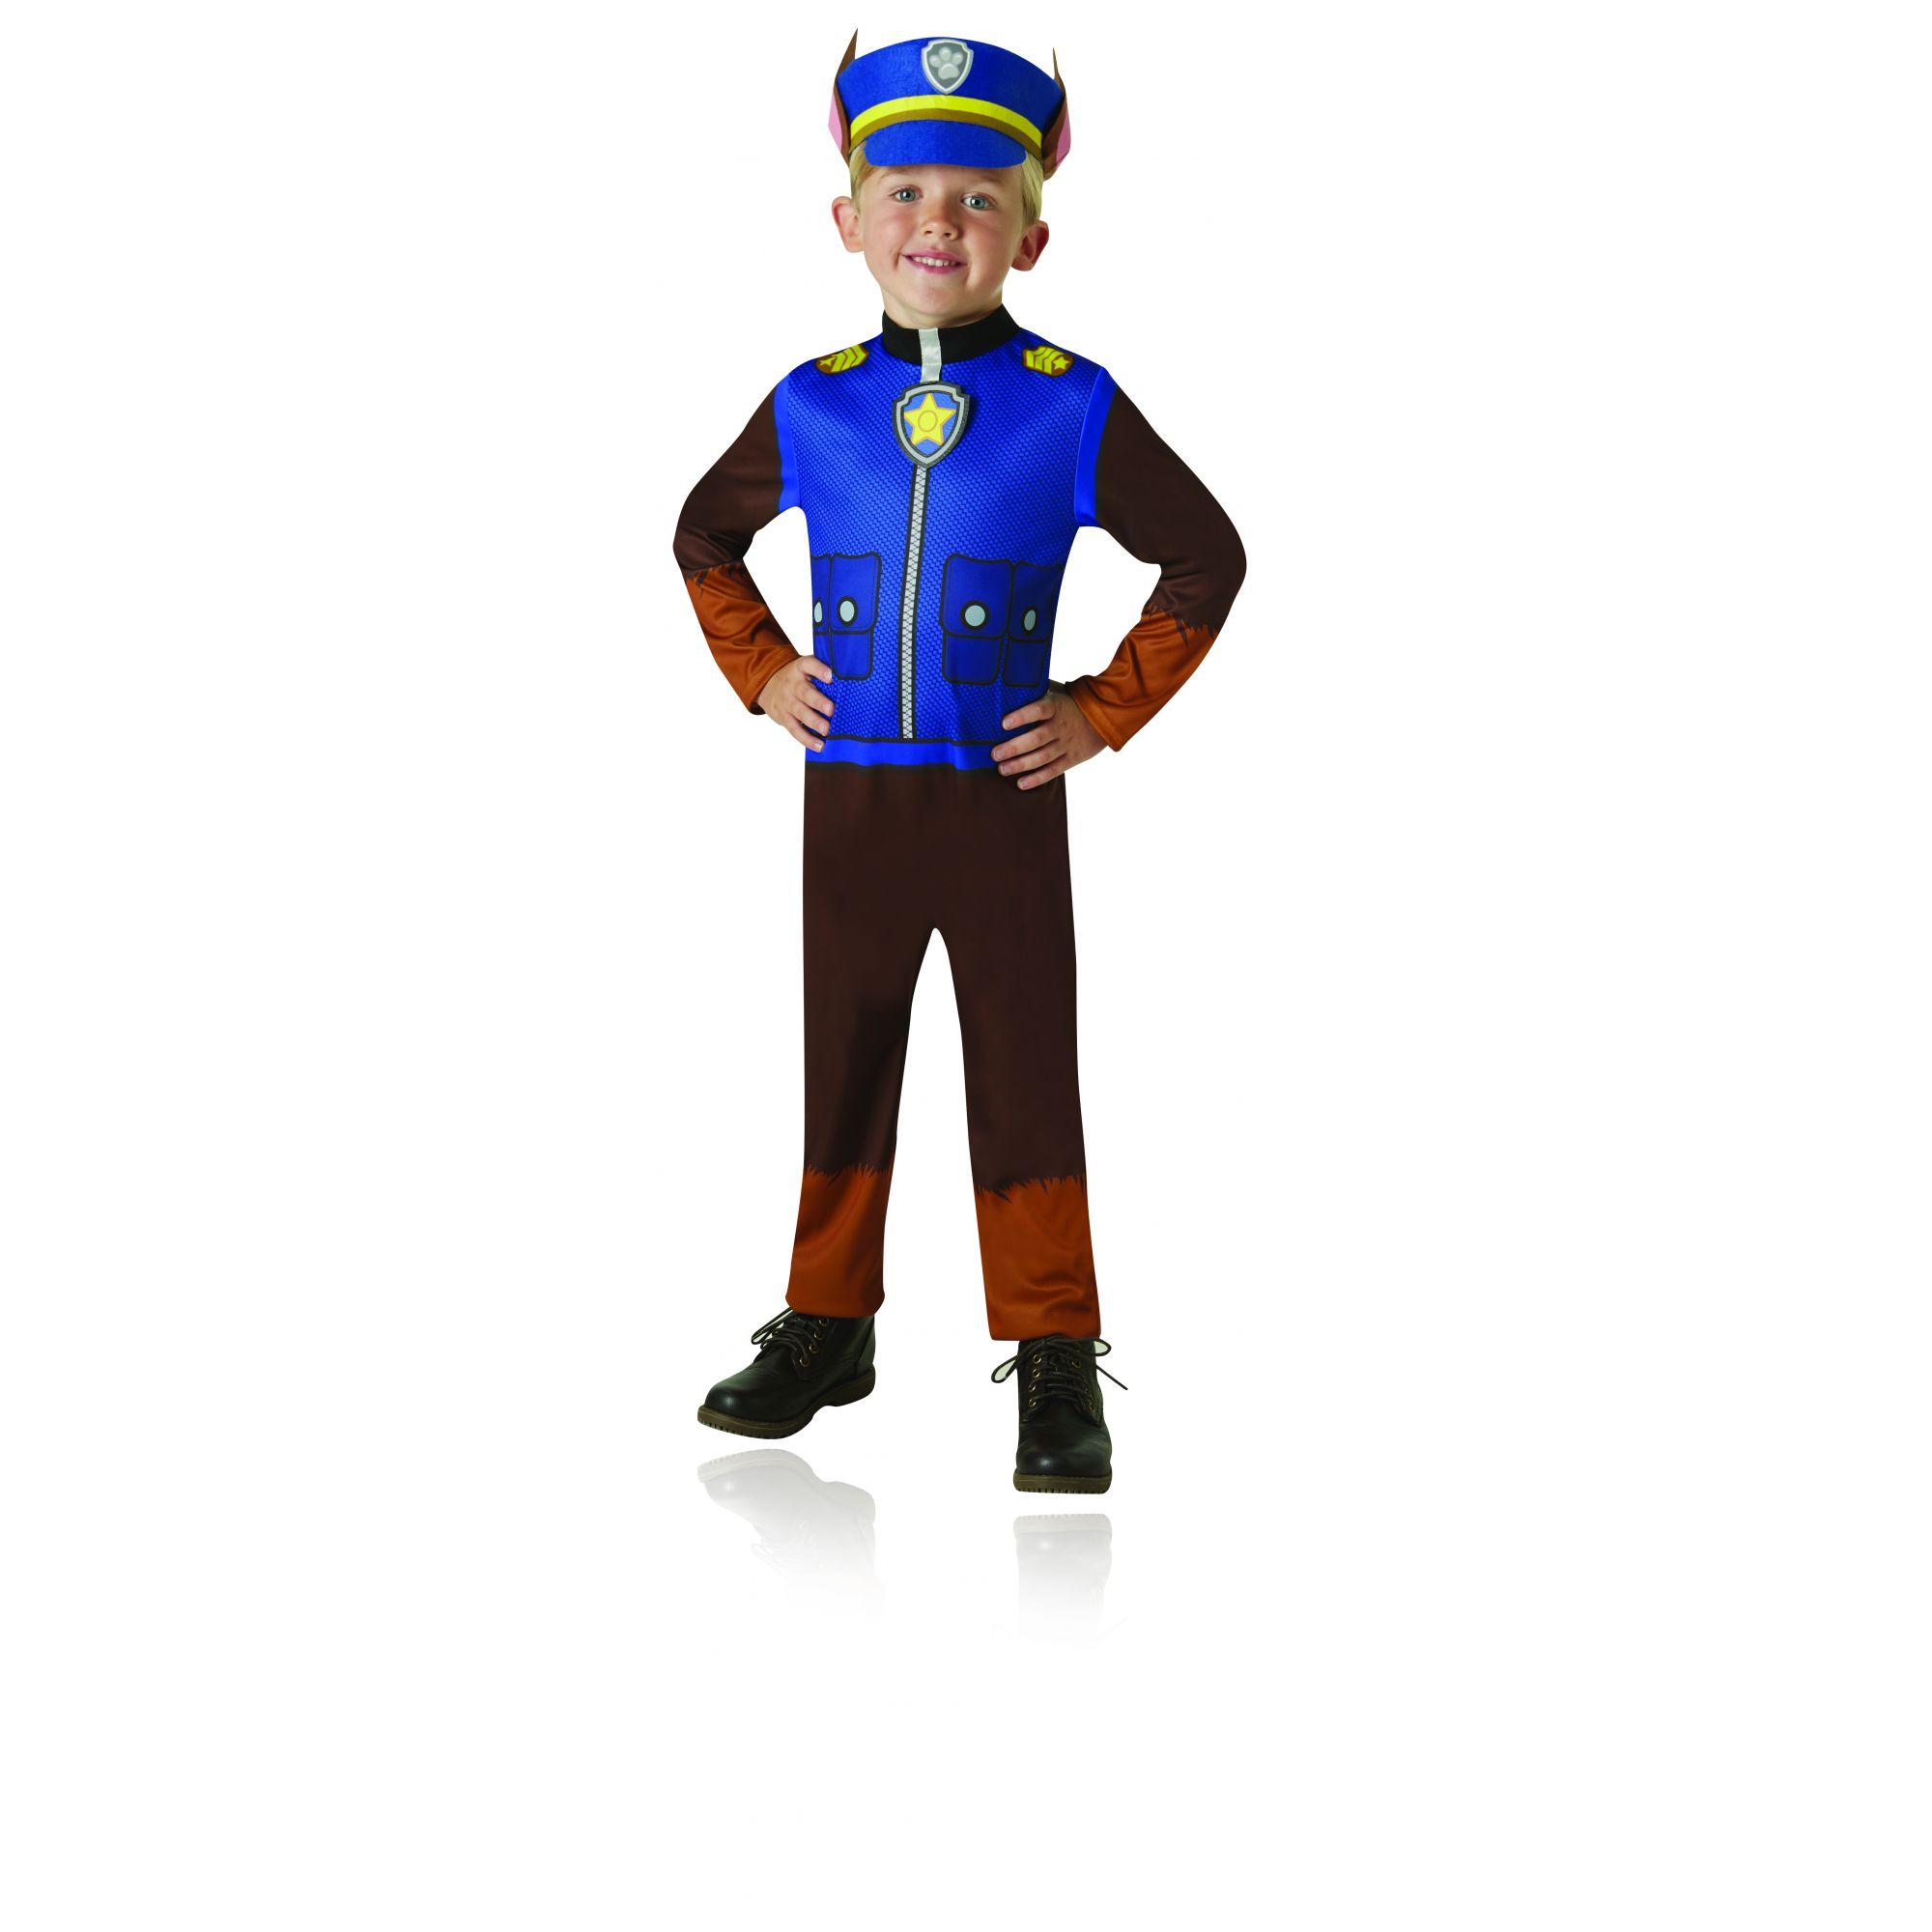 Costume Paw Patrol Chase bambino 3/4 anni